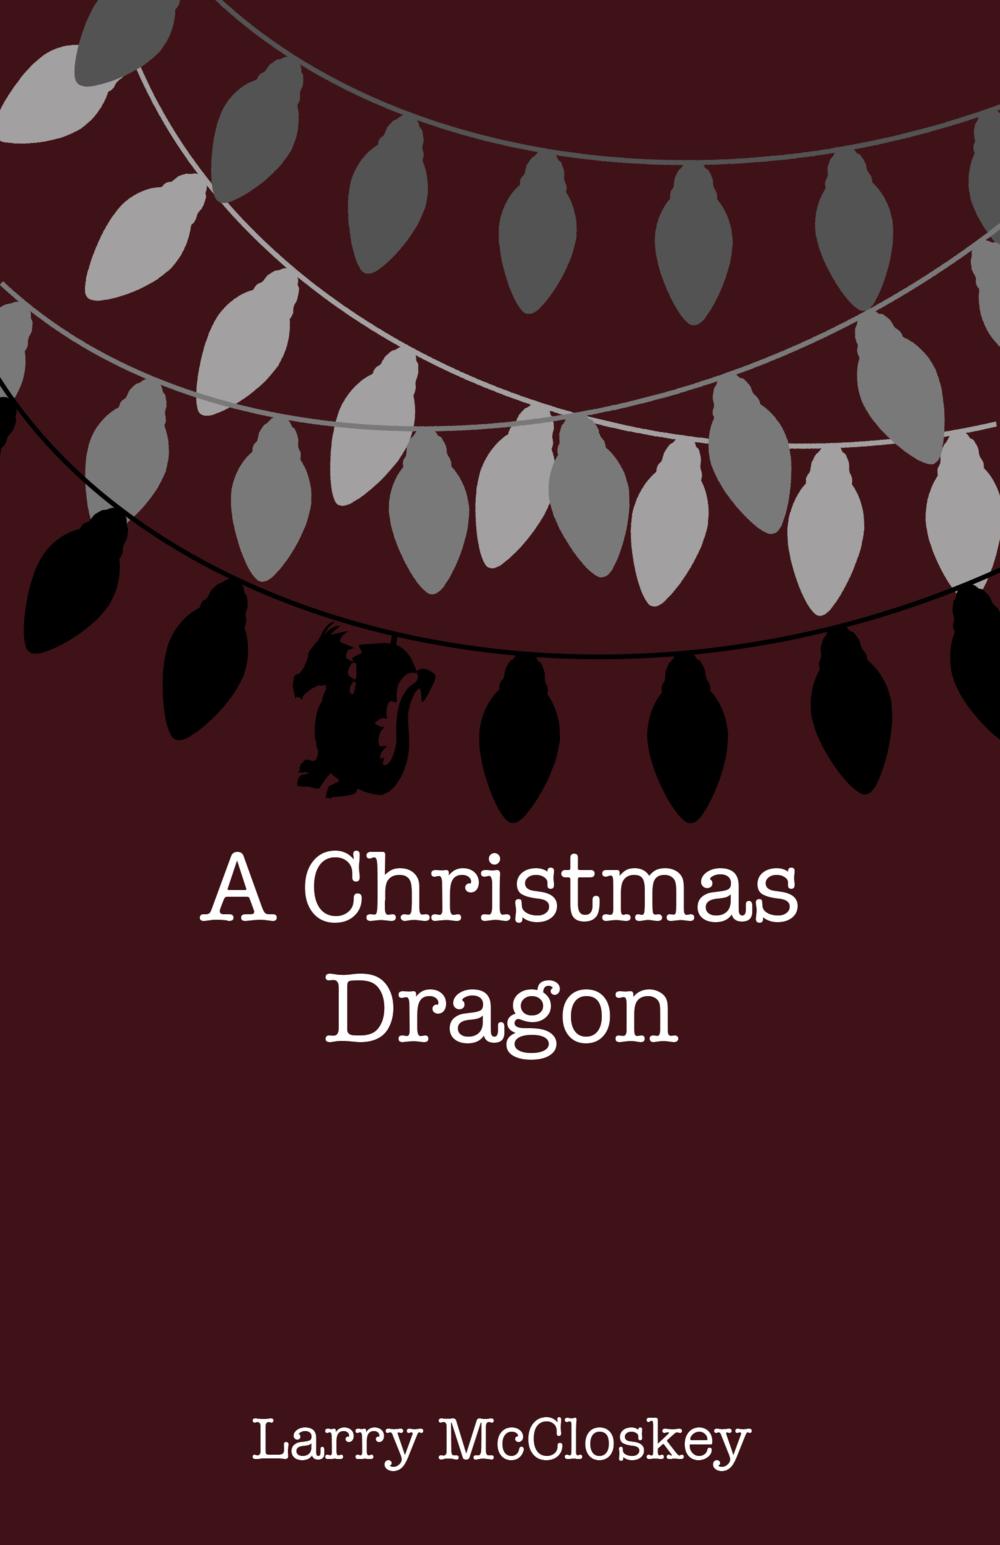 ChristmasDragon_coverArt_04.png